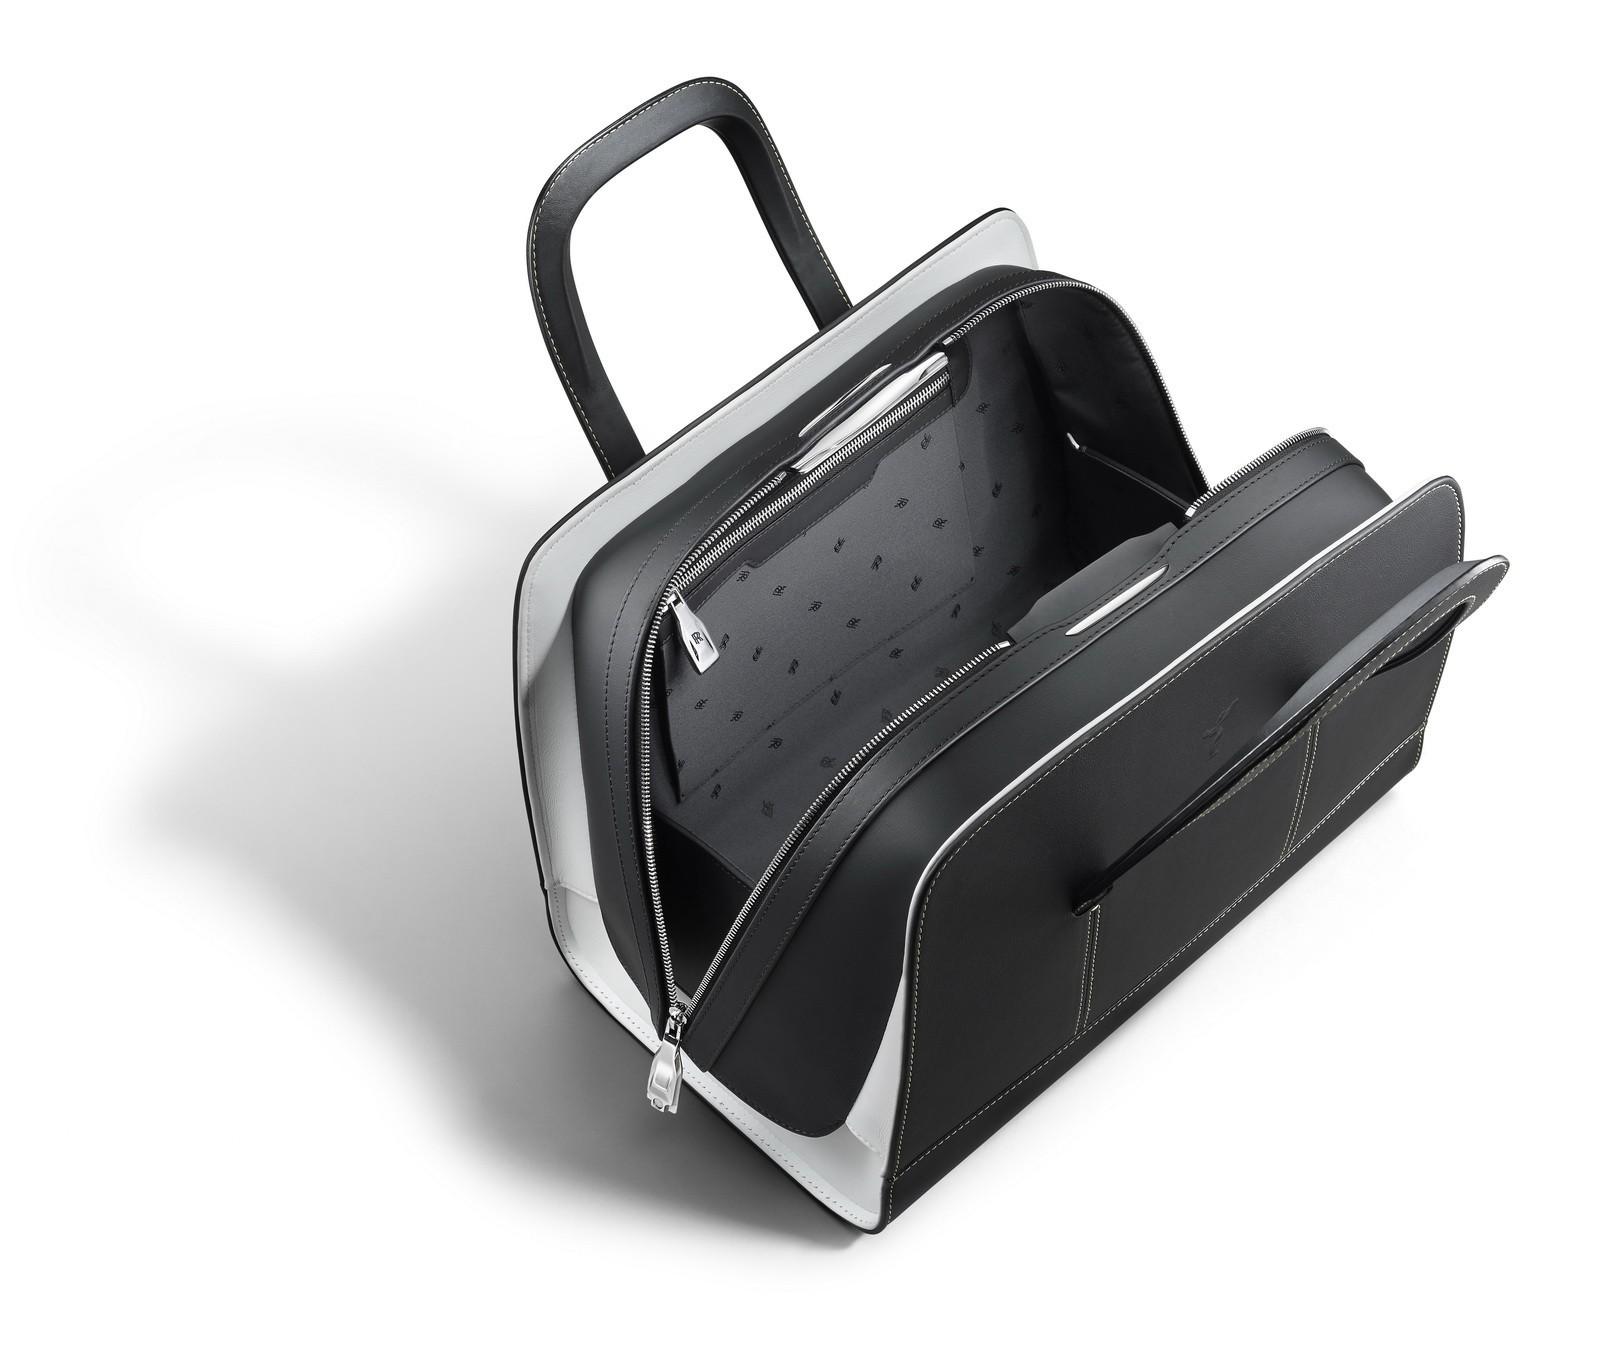 Foto de Rolls-Royce - Set de maletas (4/9)